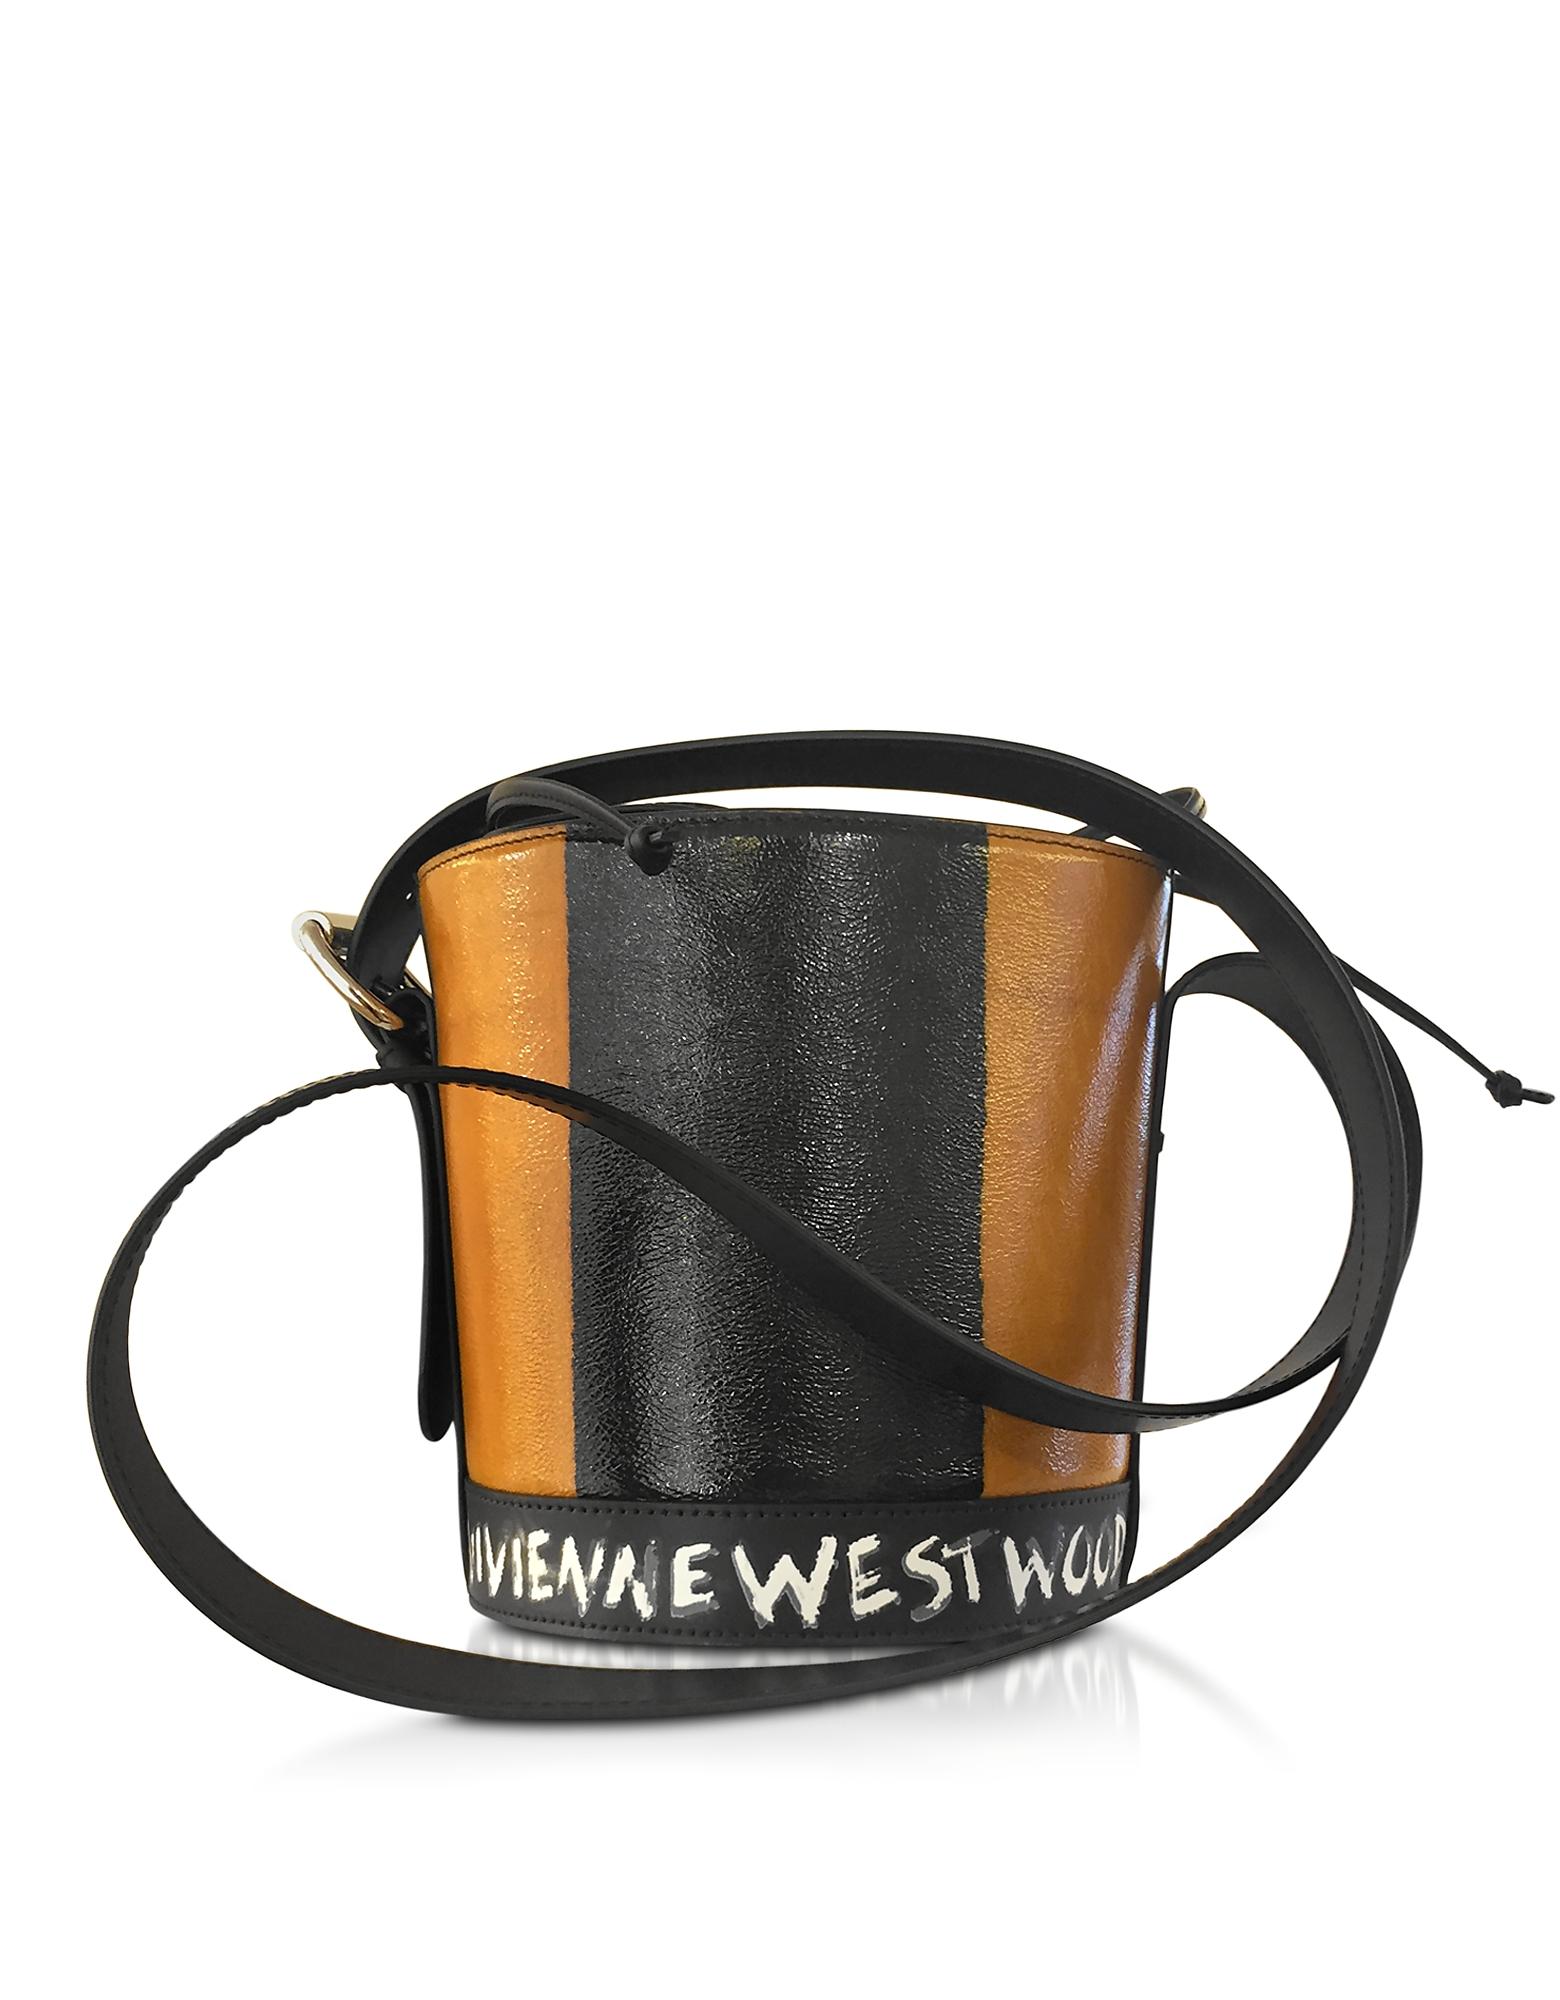 Vivienne Westwood Buckingham - Фирменная Сумка Ковш из Кожи Цвета Загара